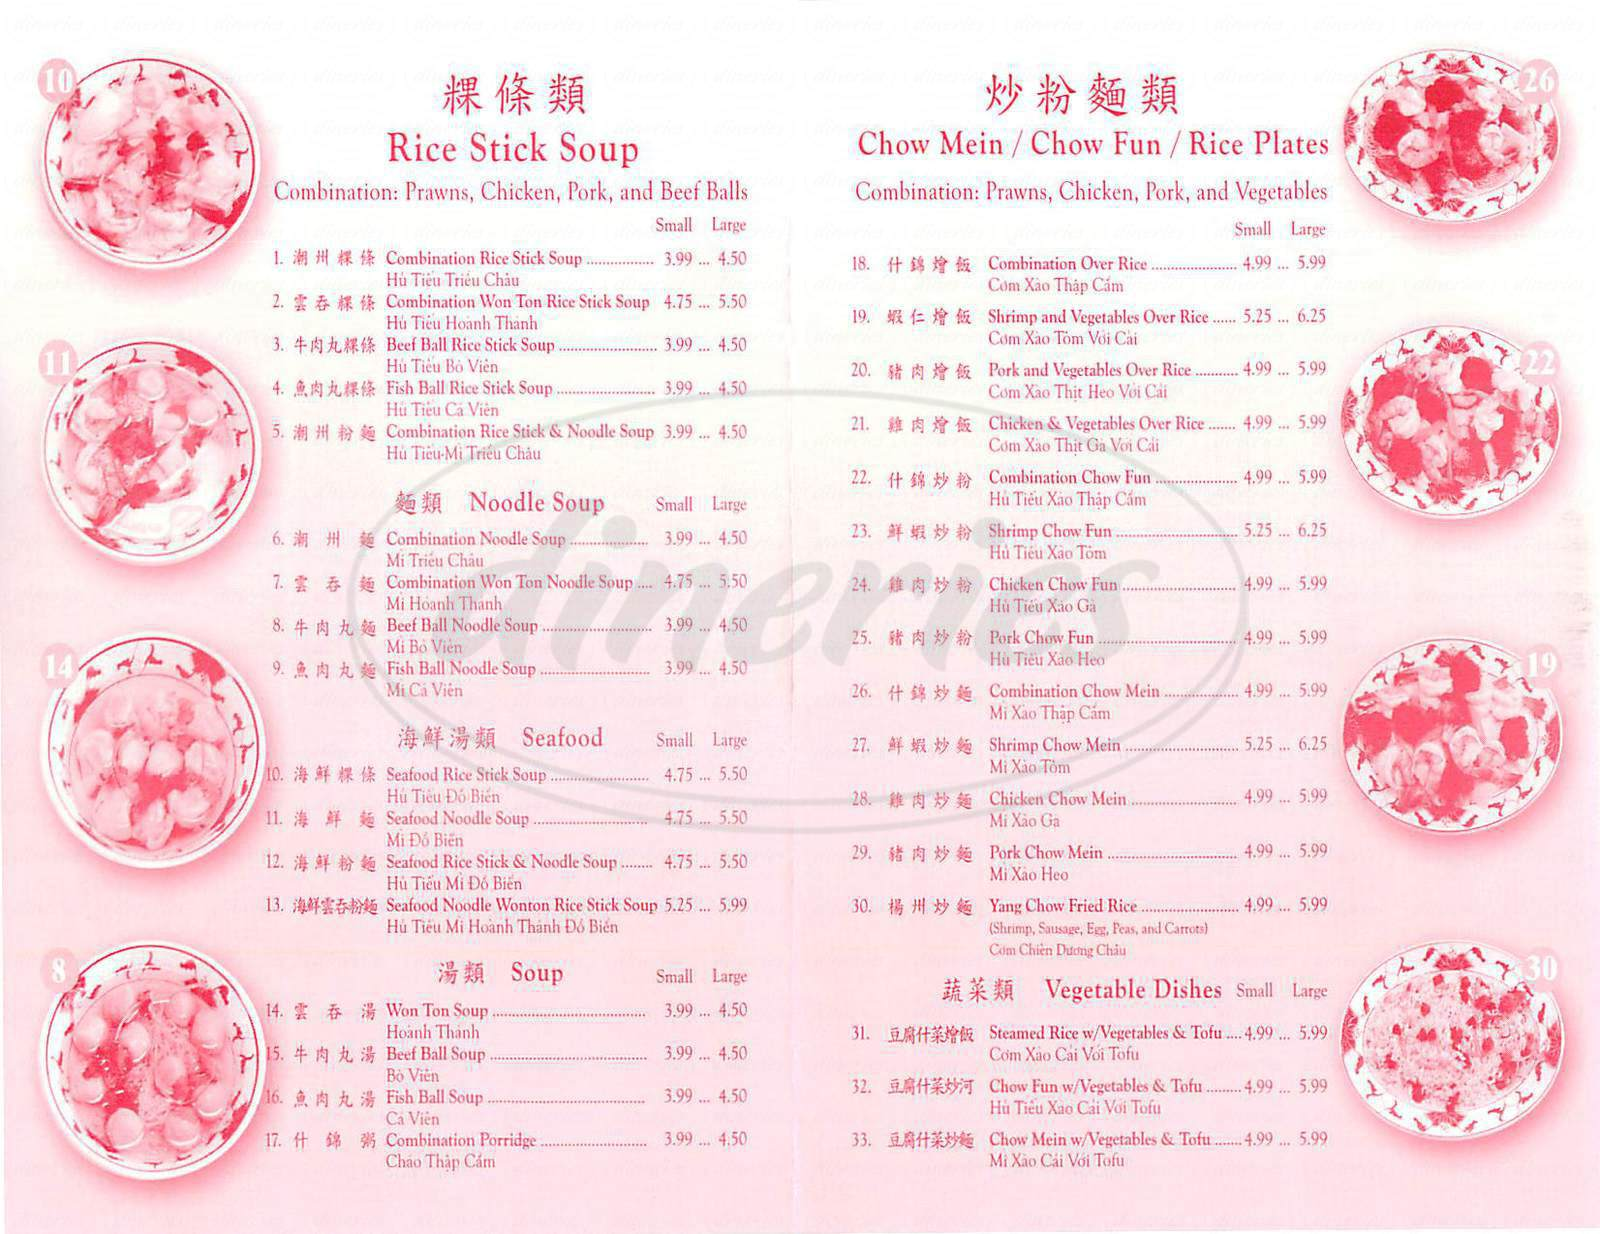 menu for Hai Kee Noodle